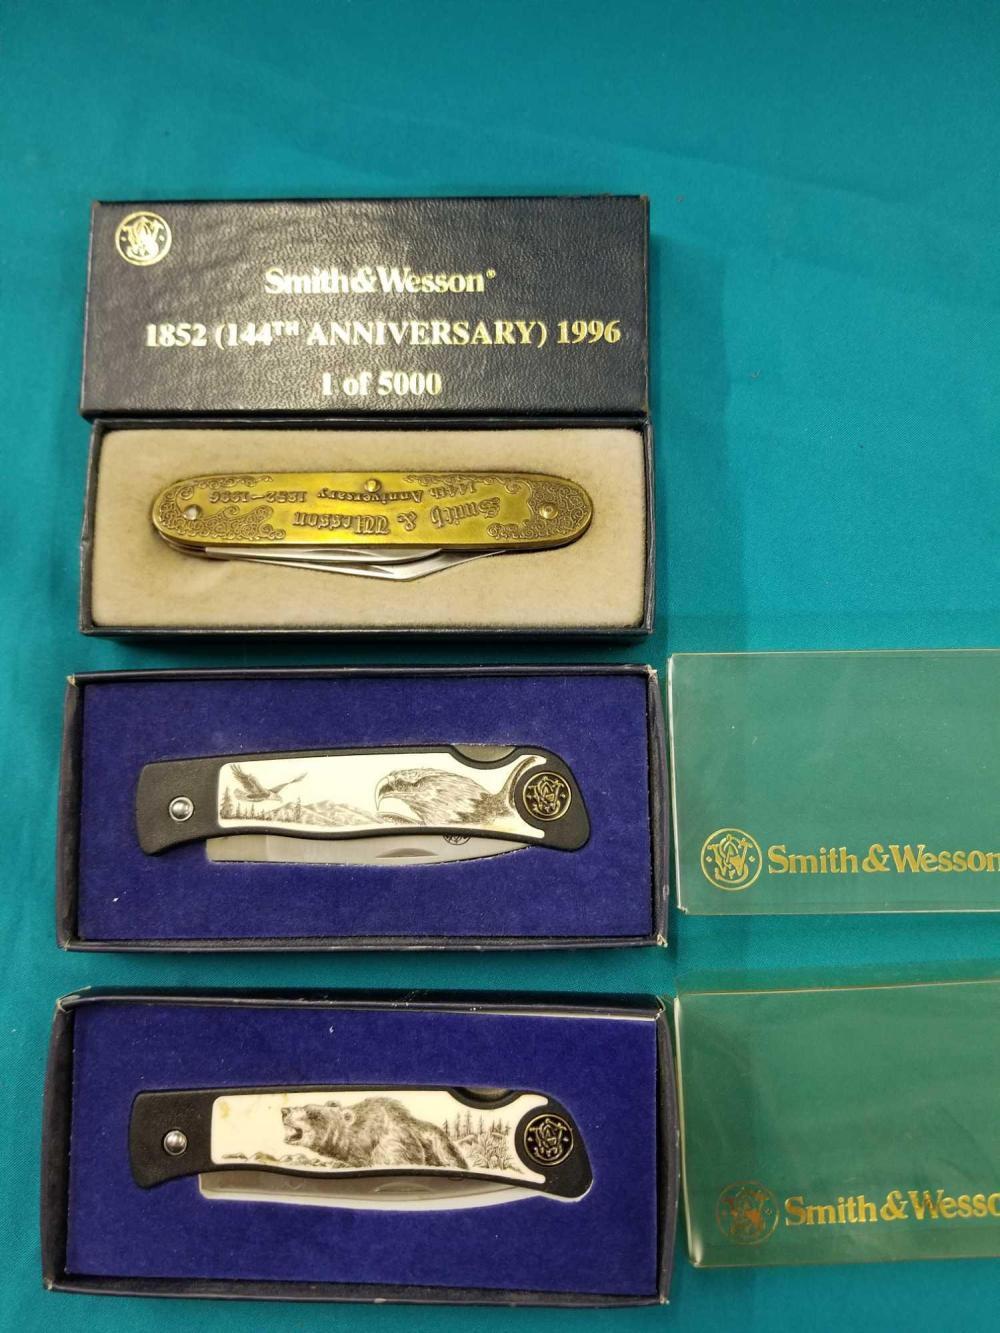 SMITH & WESSON ANNIVERSARY & WILDLIFE SERIES FOLDING POCKET KNIVES - 3 ITEMS